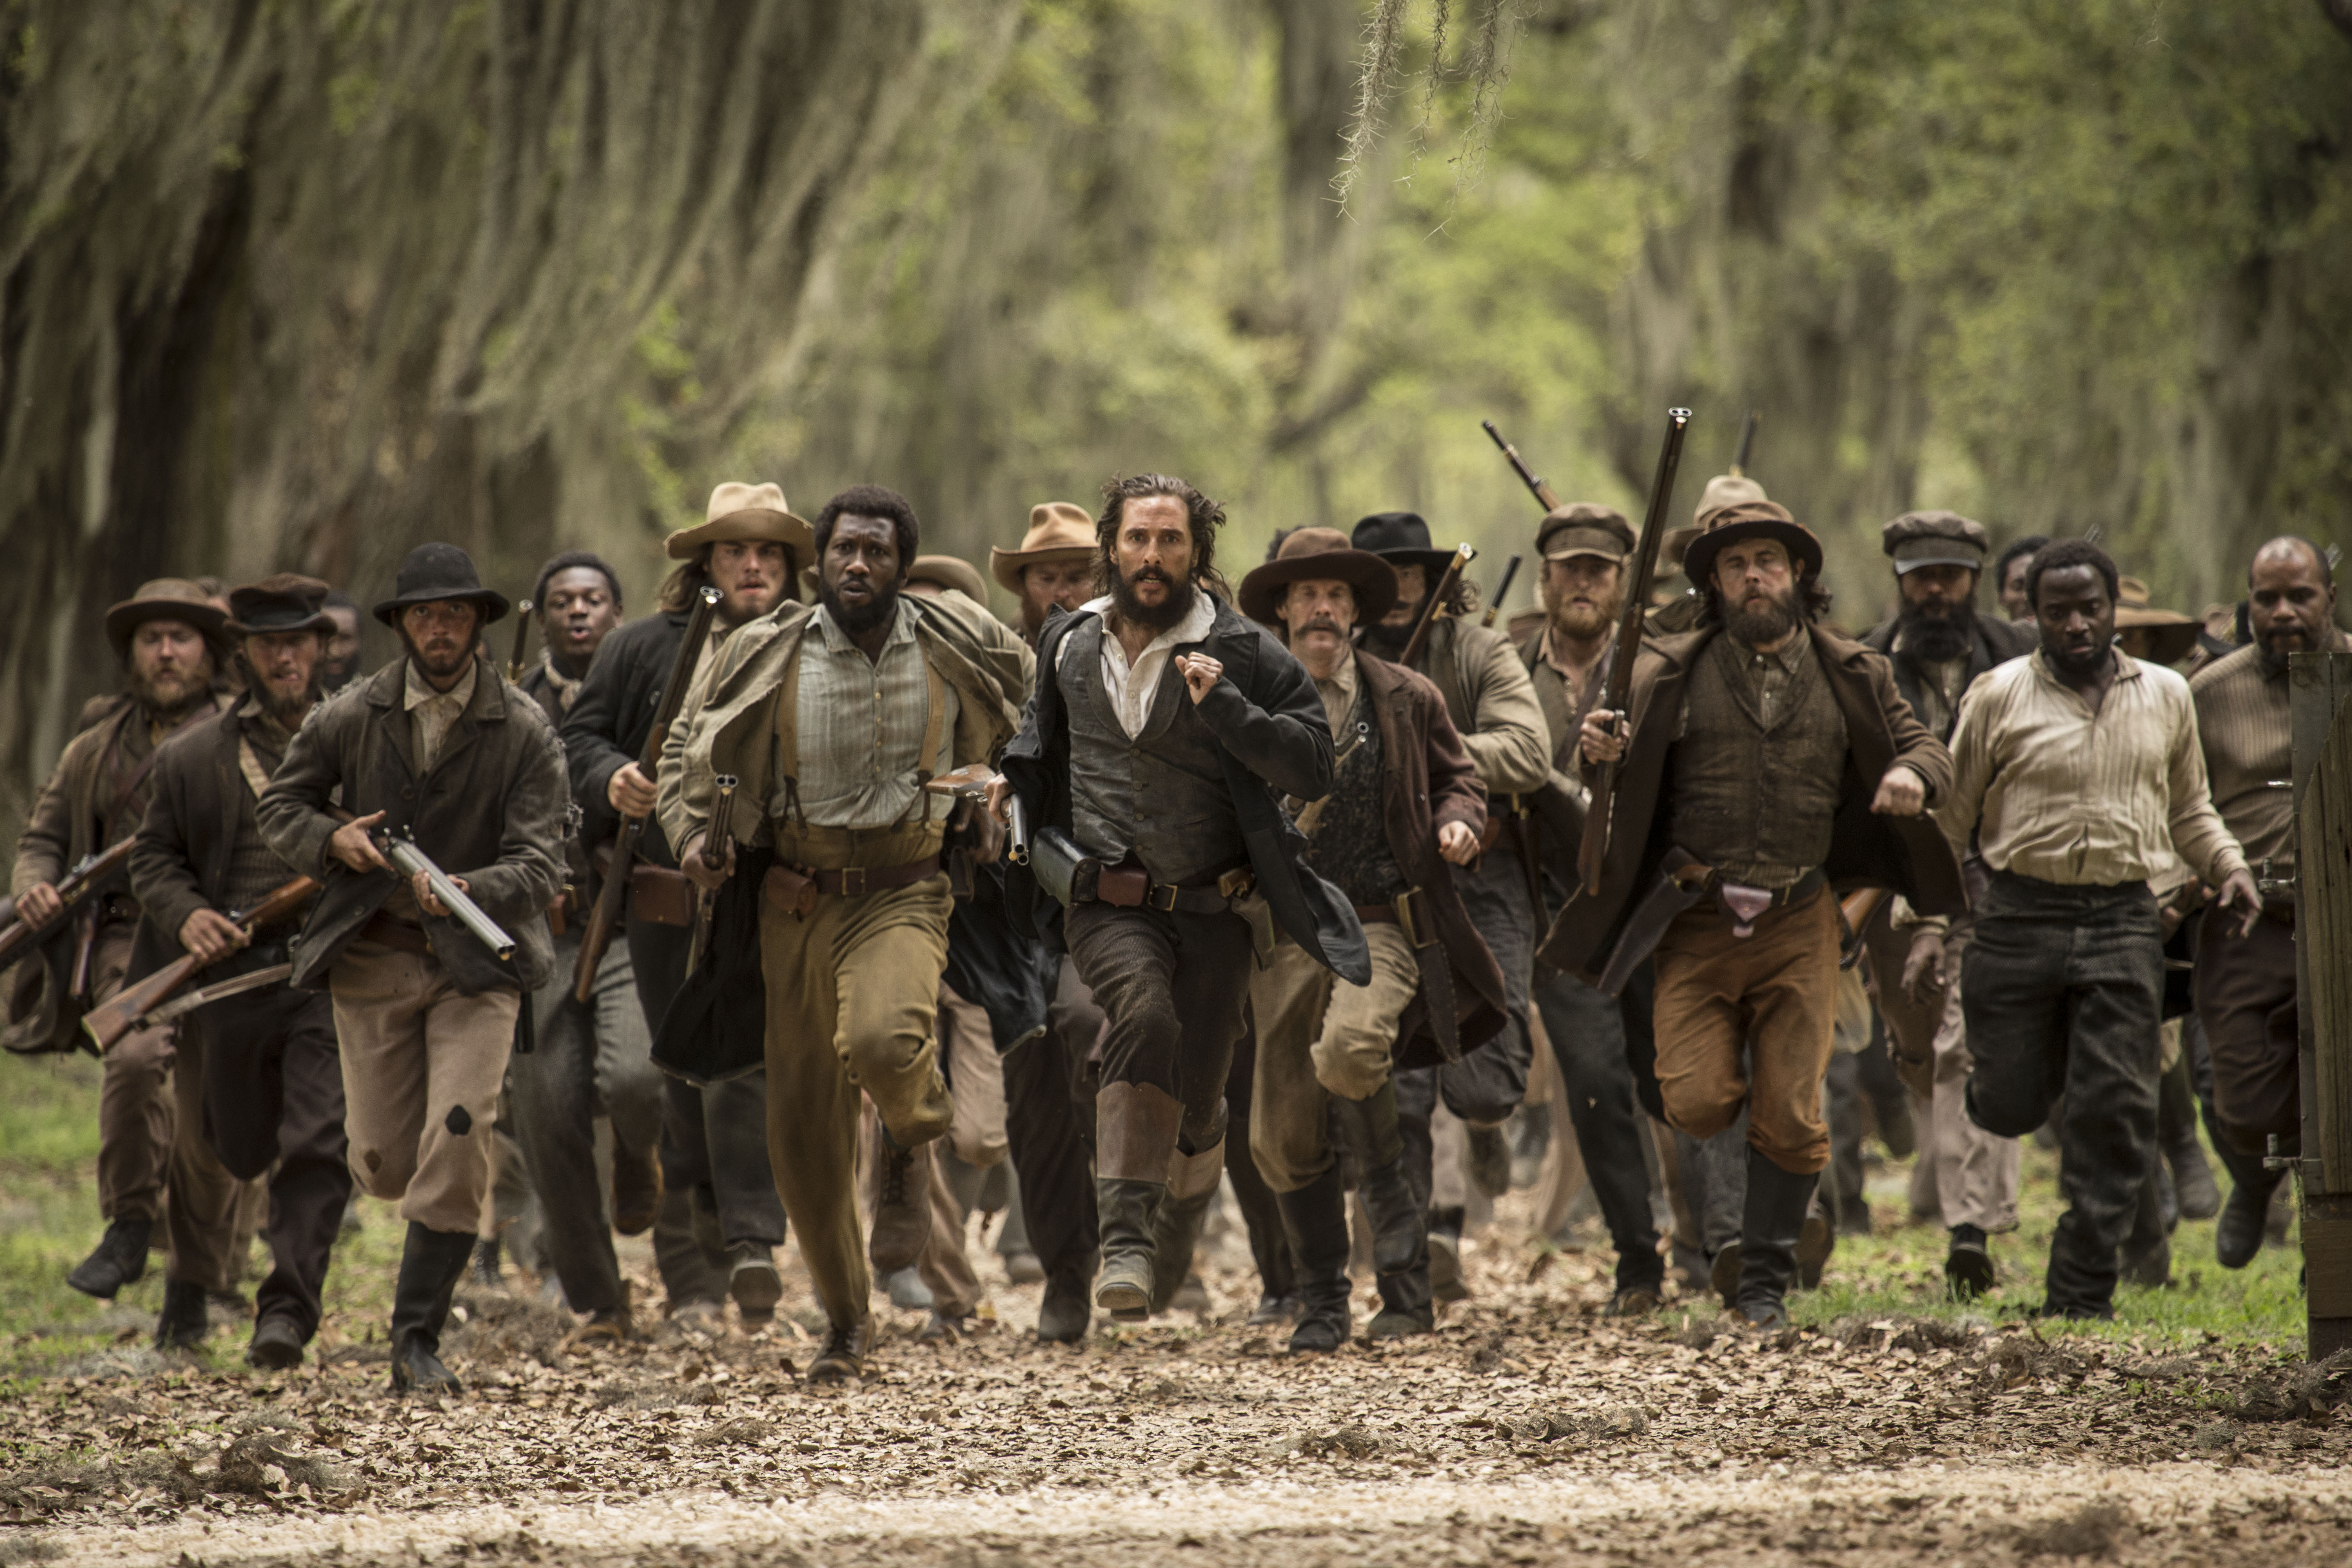 Matthew McConaughey (center) and Mahershala Ali (center left) star in The Free State of Jones